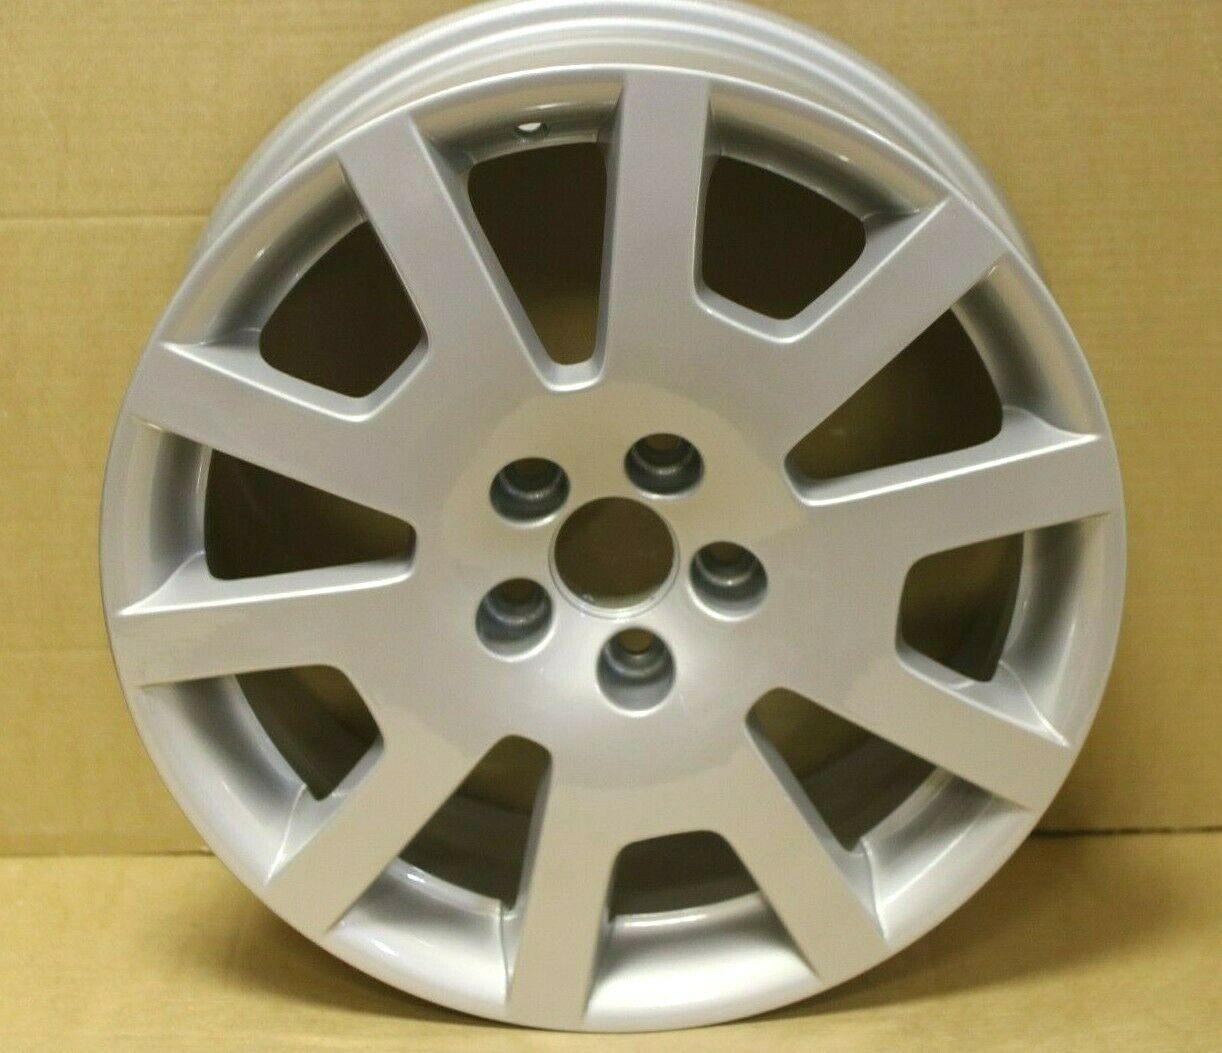 1 Genuine Original Oem Skoda Fabia Mk1 Vrs 16 Alloy Wheel Rim Silver 6y0601025m For Sale Online Ebay